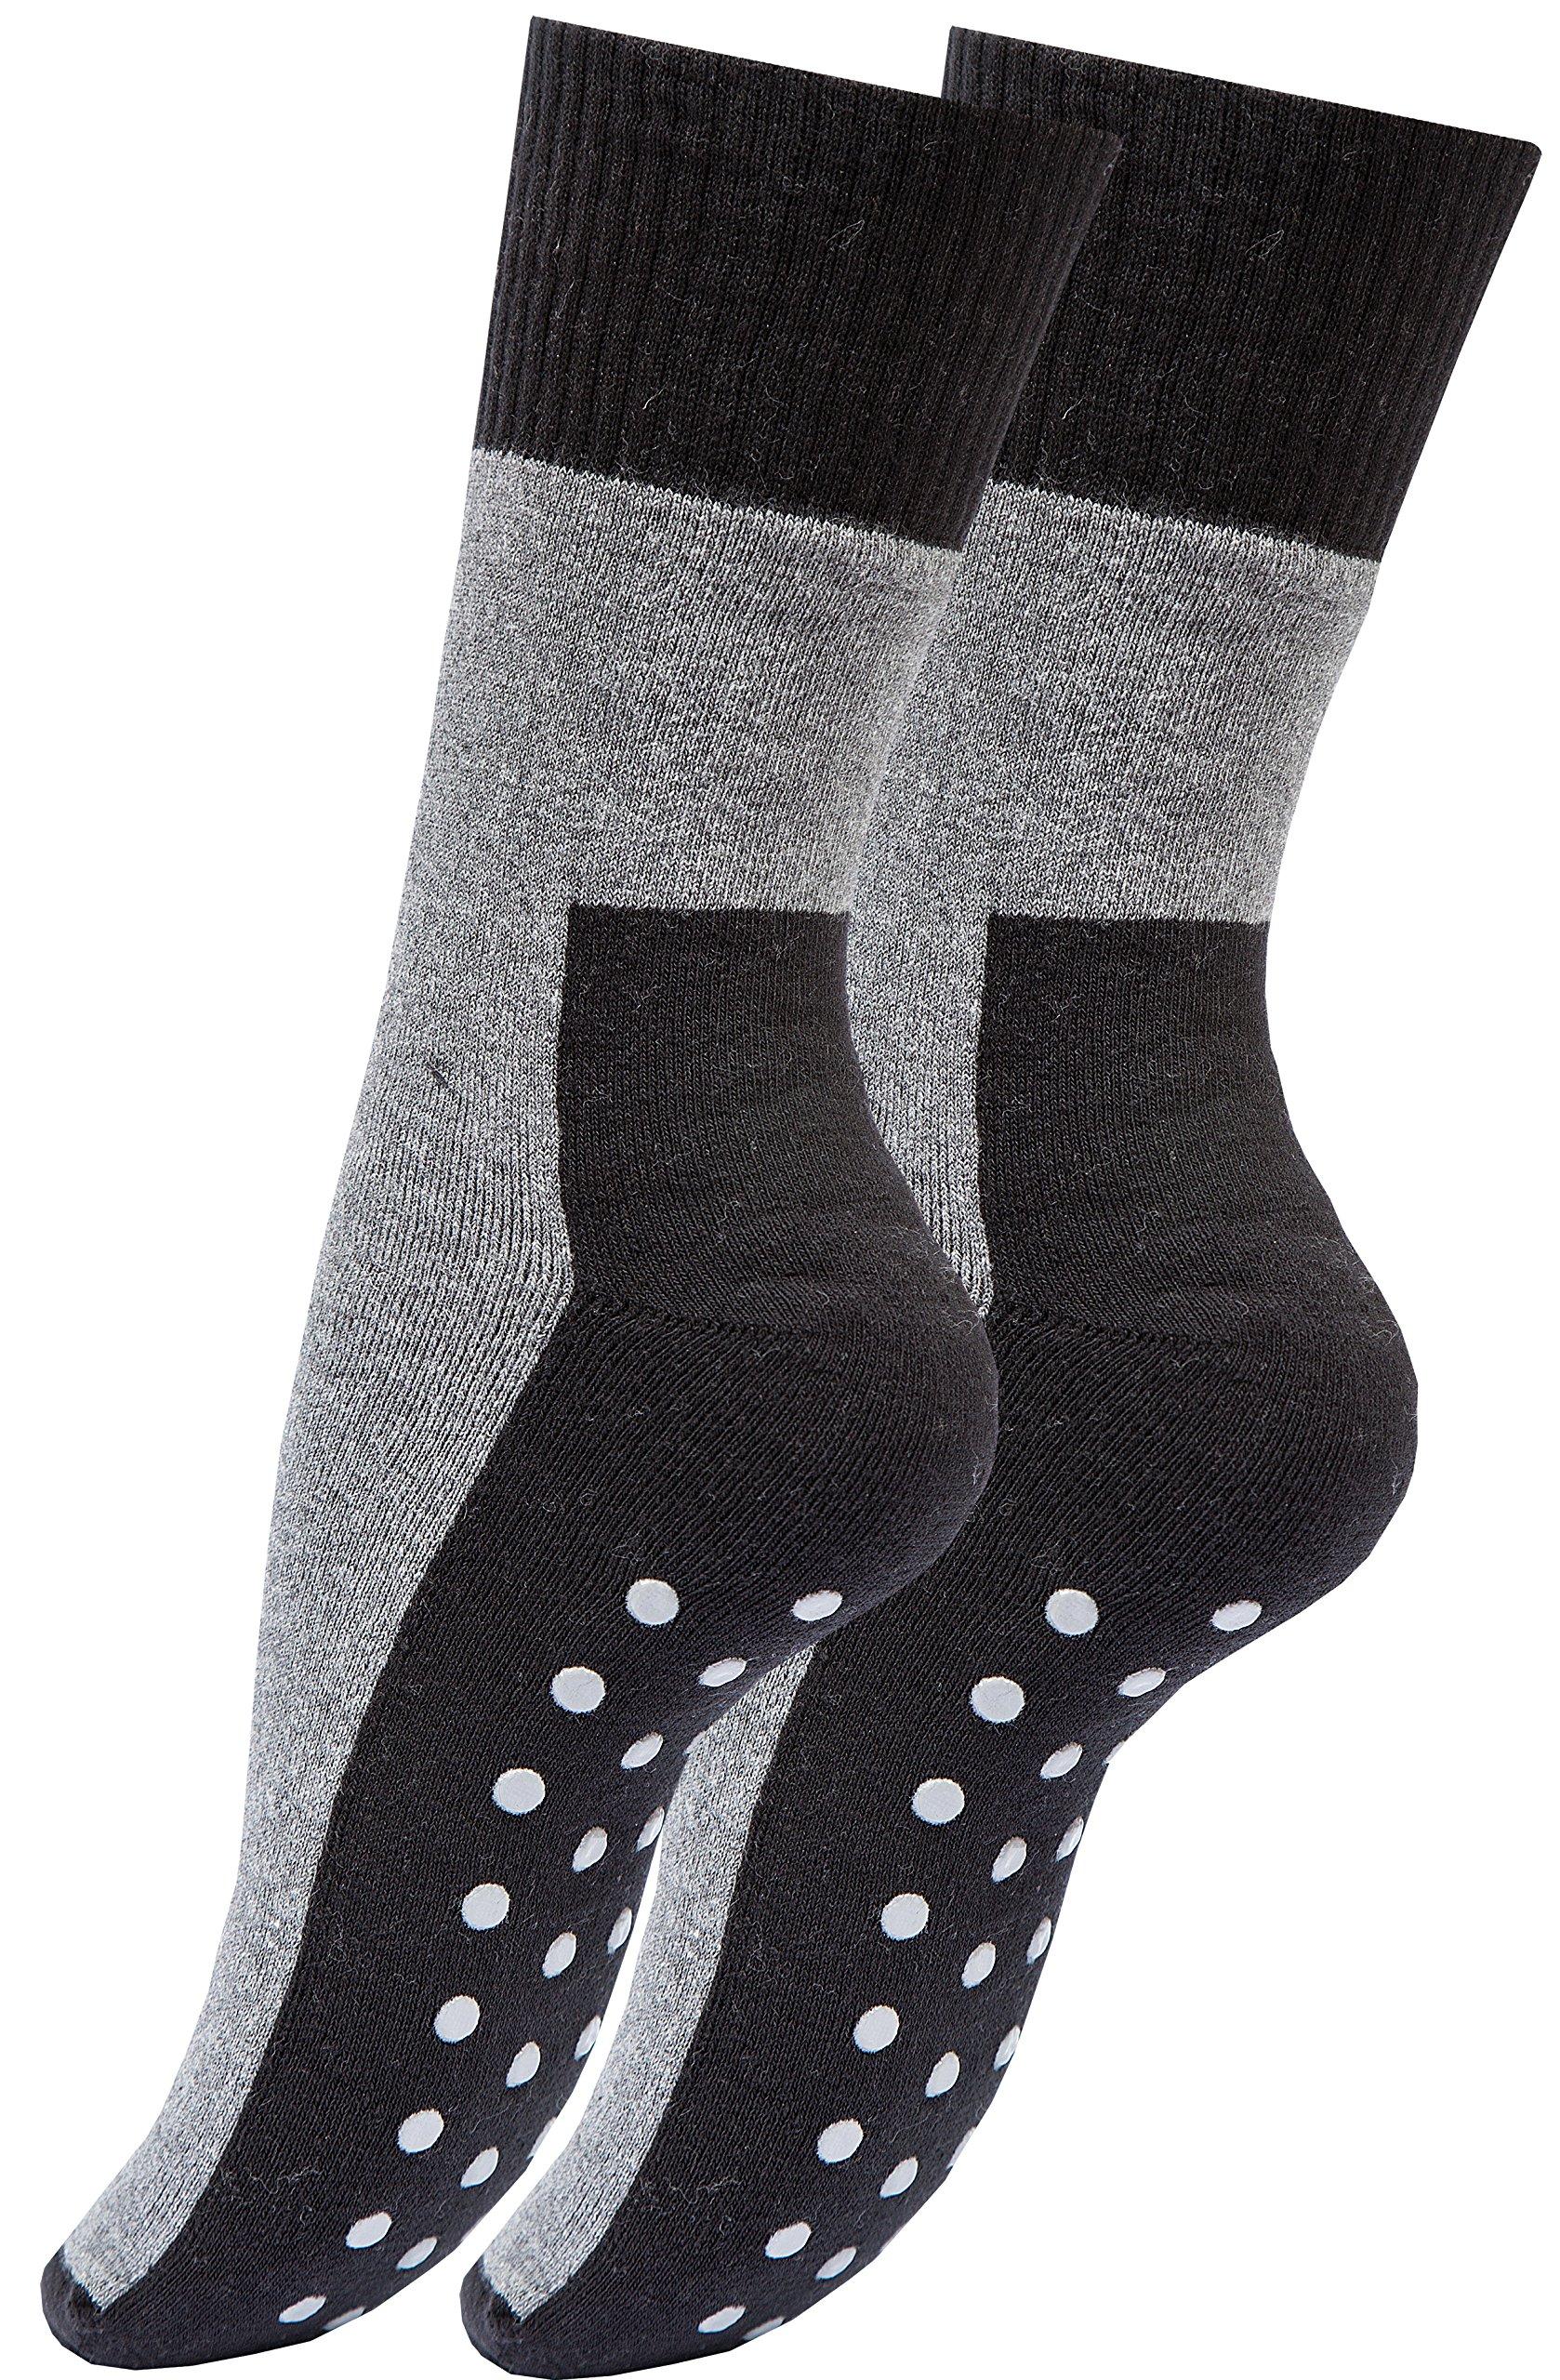 Vincent Creation® 4 pares ABS calcetines unisex – Con antideslizante suela product image